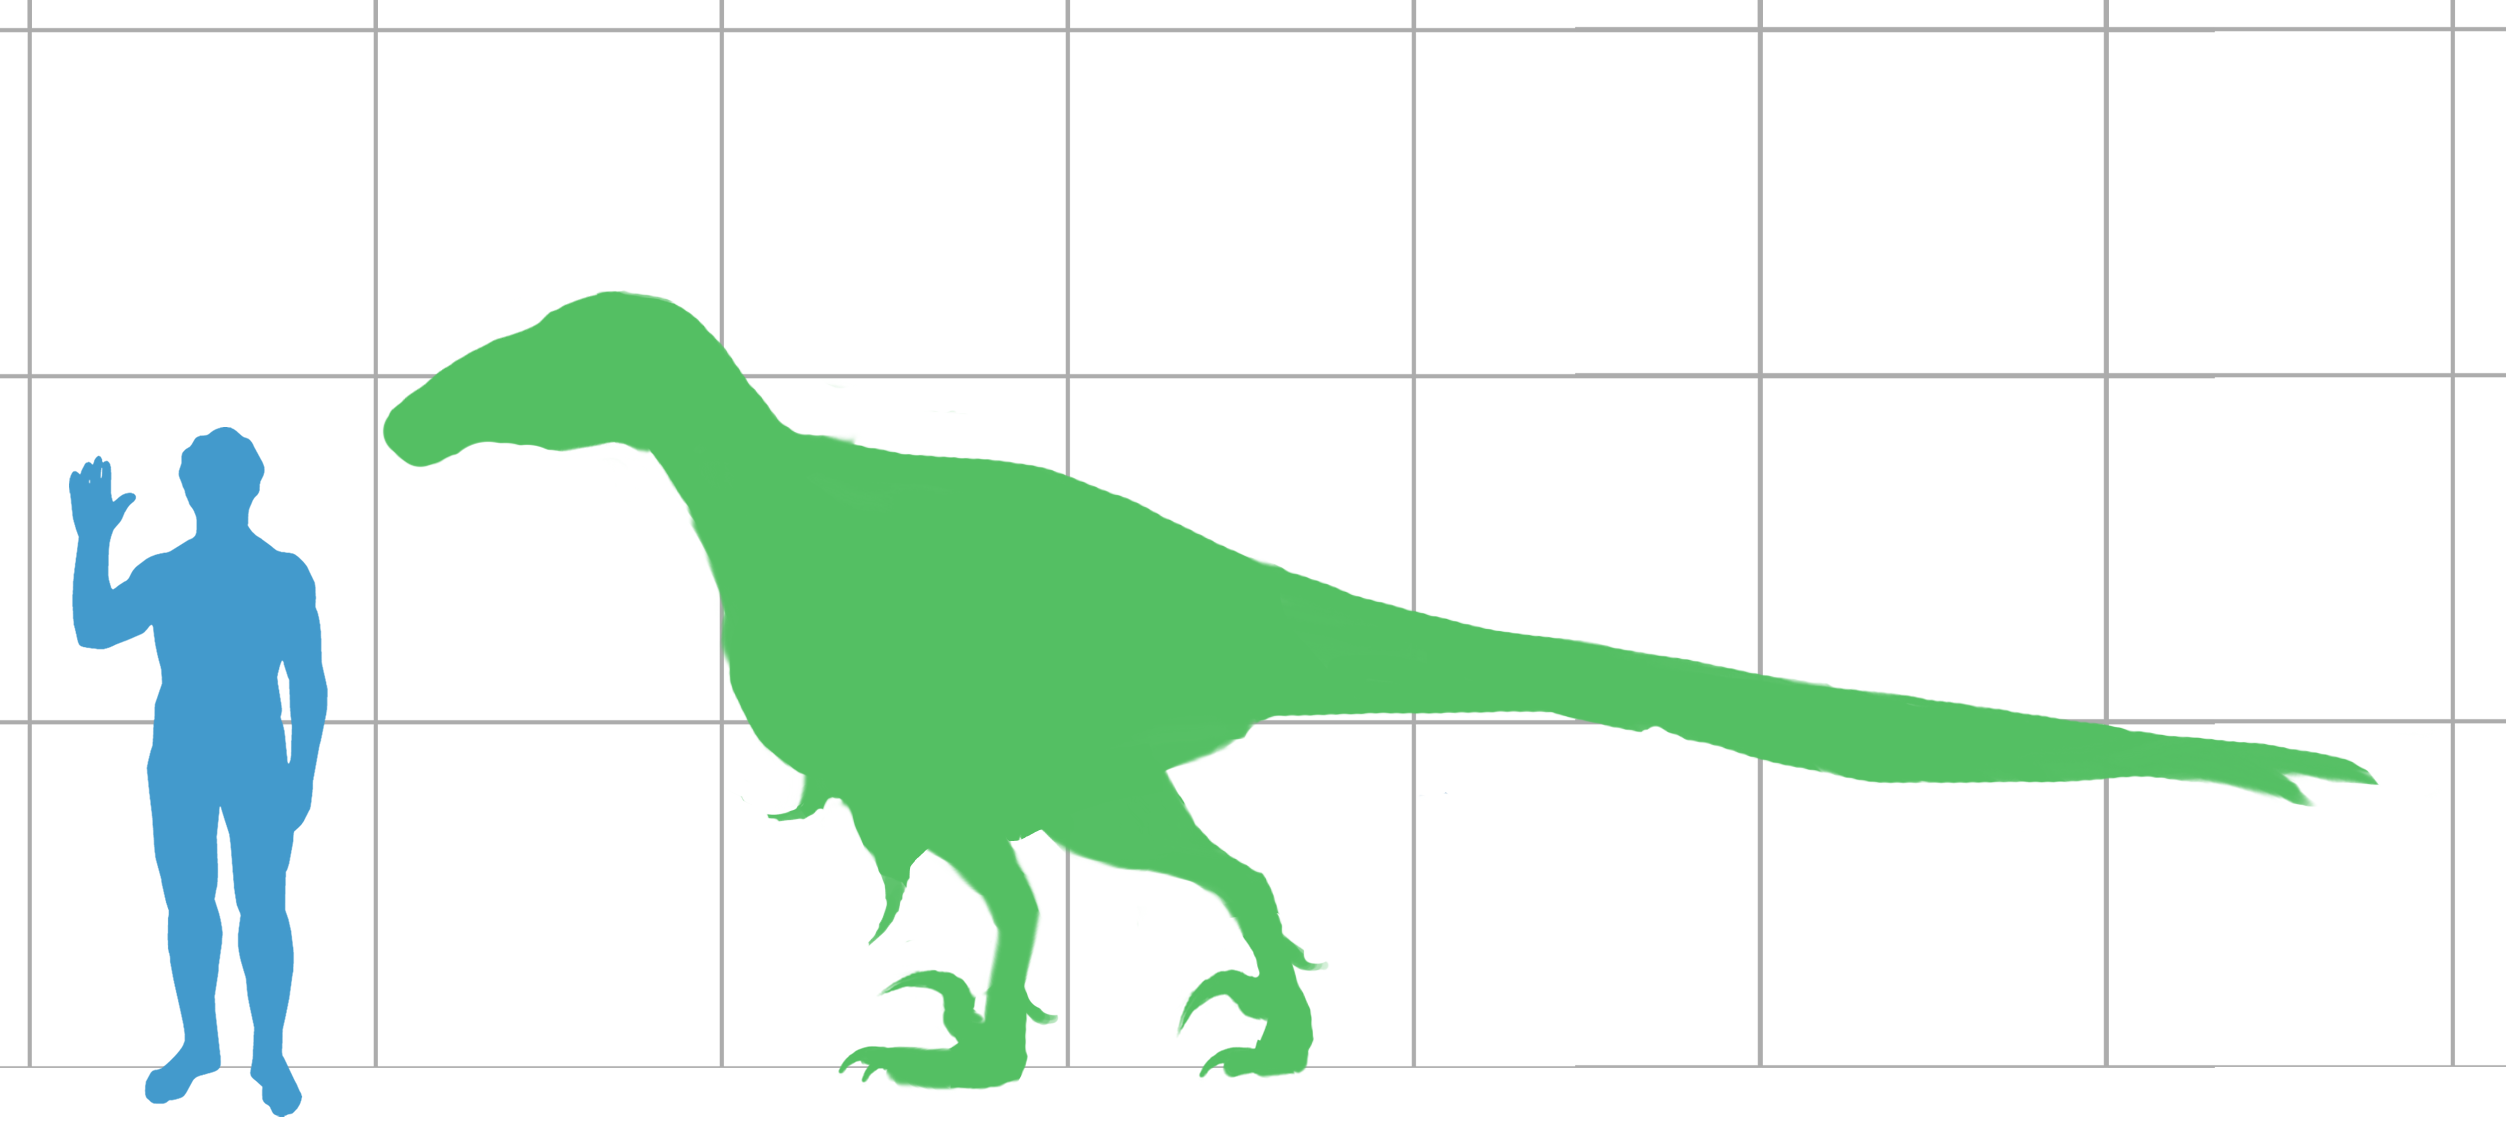 utahraptor_scale.png